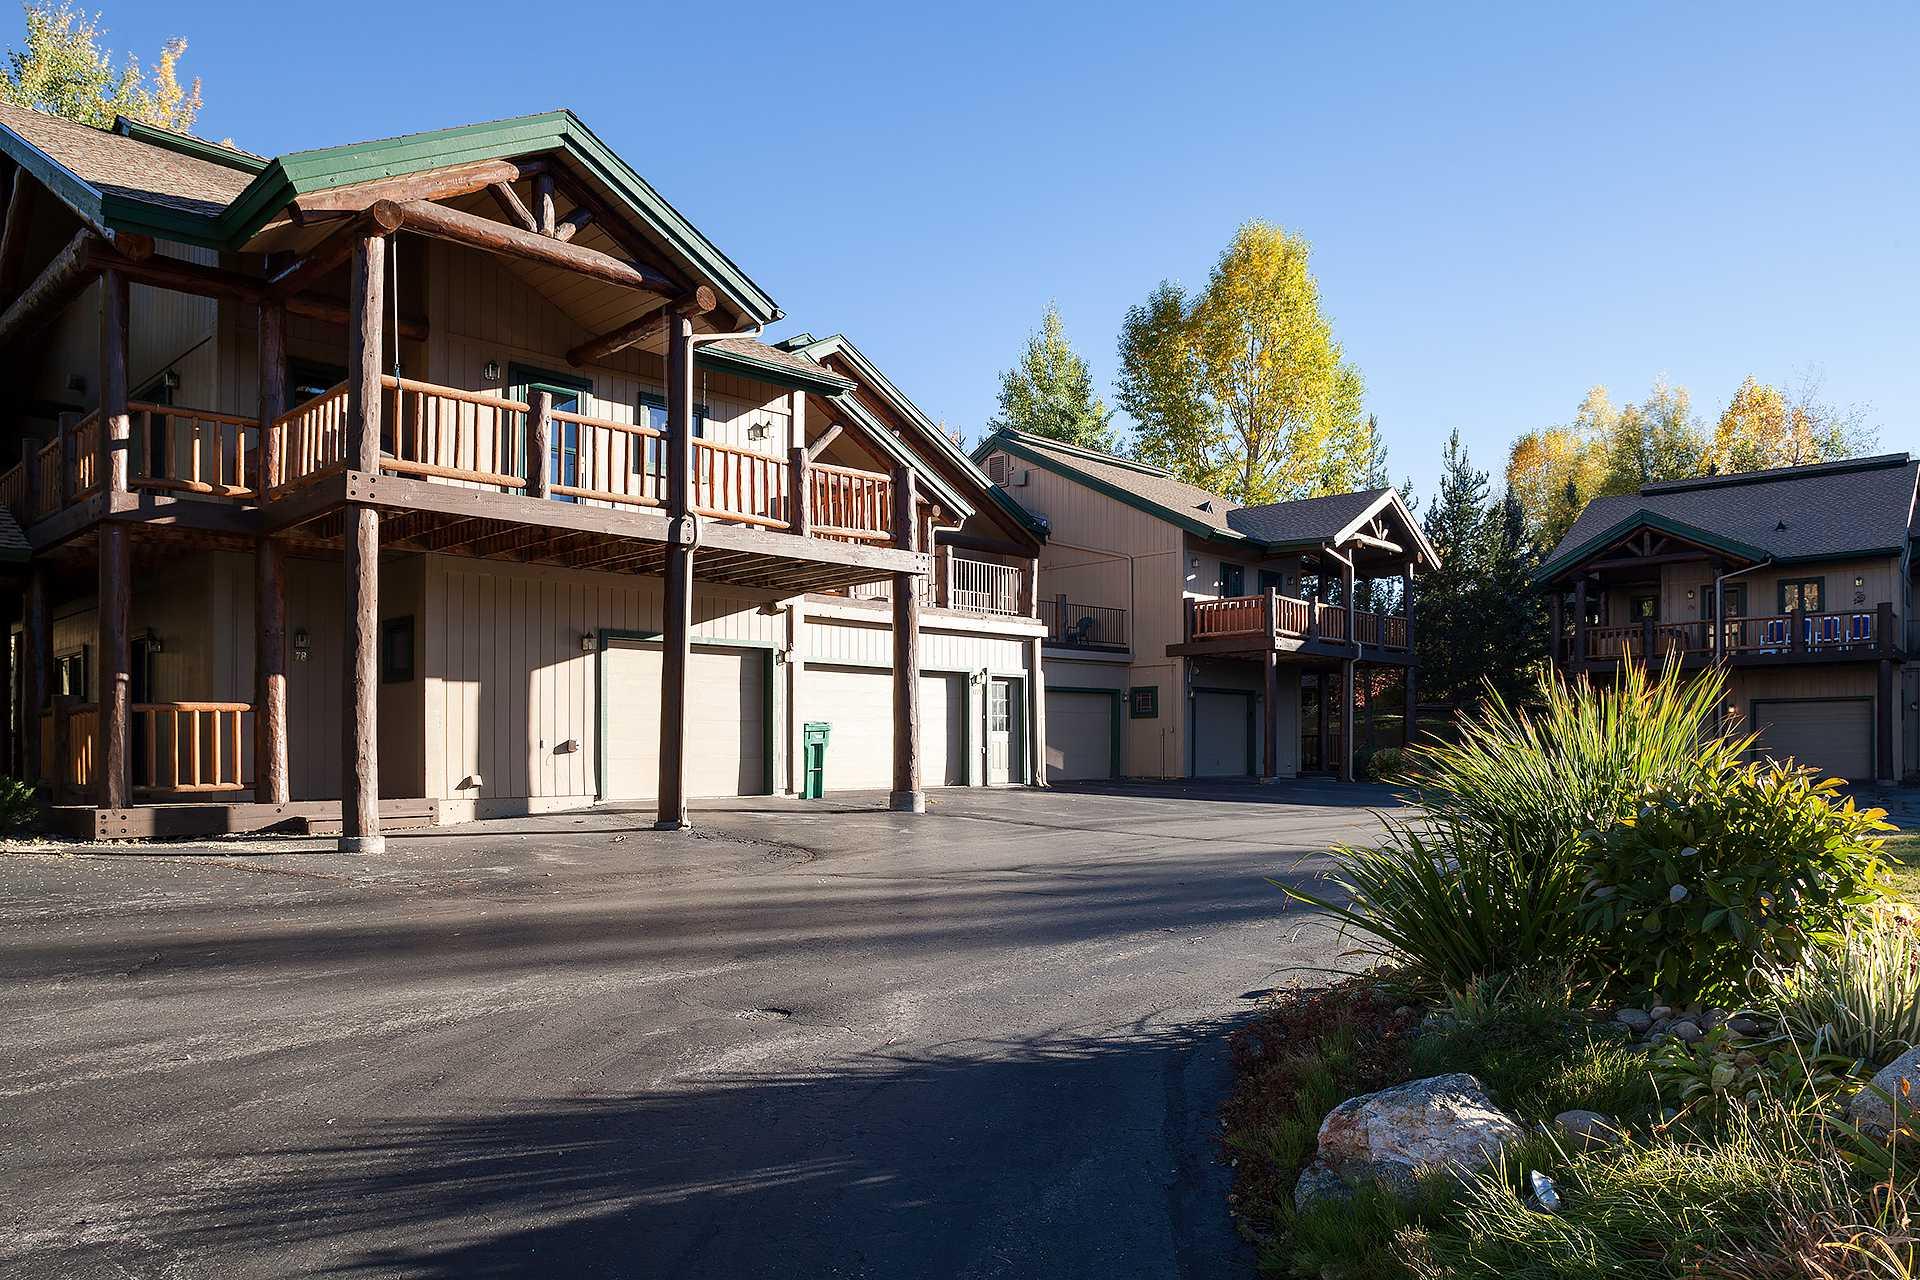 SC710 - Saddle Creek Townhomes